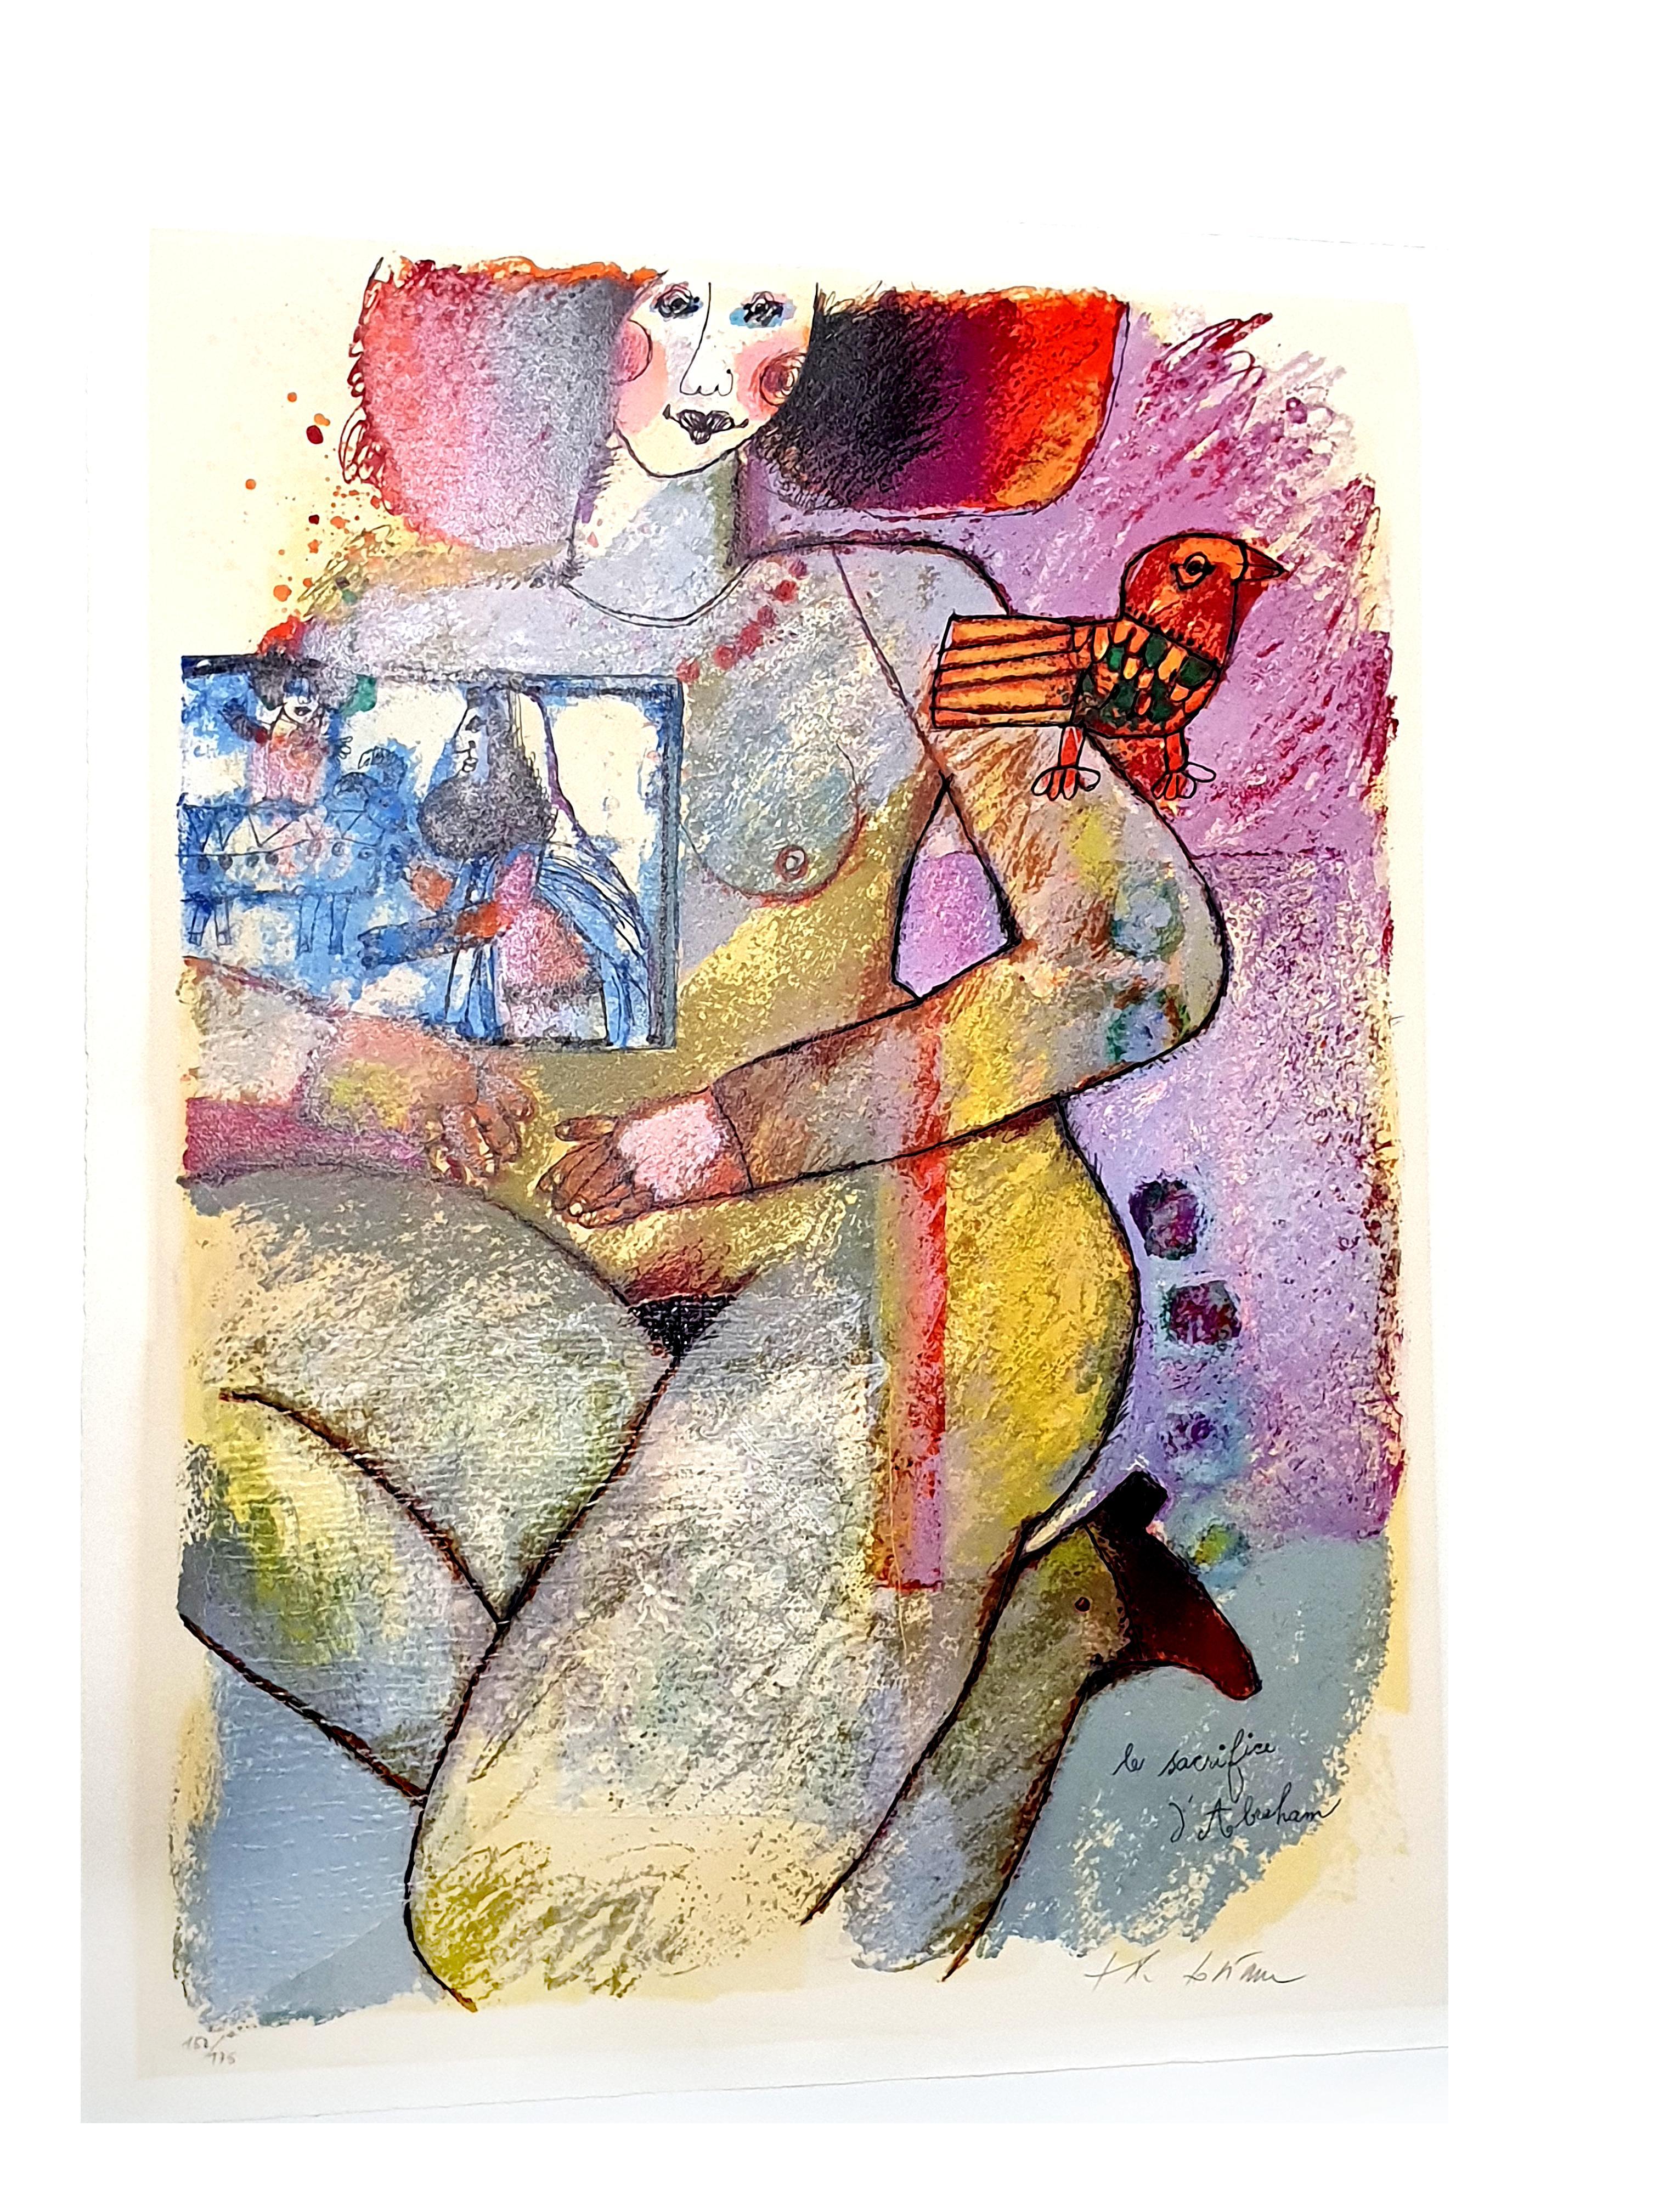 Théo Tobiasse - Abraham Sacrifice - Original Lithograph with collage